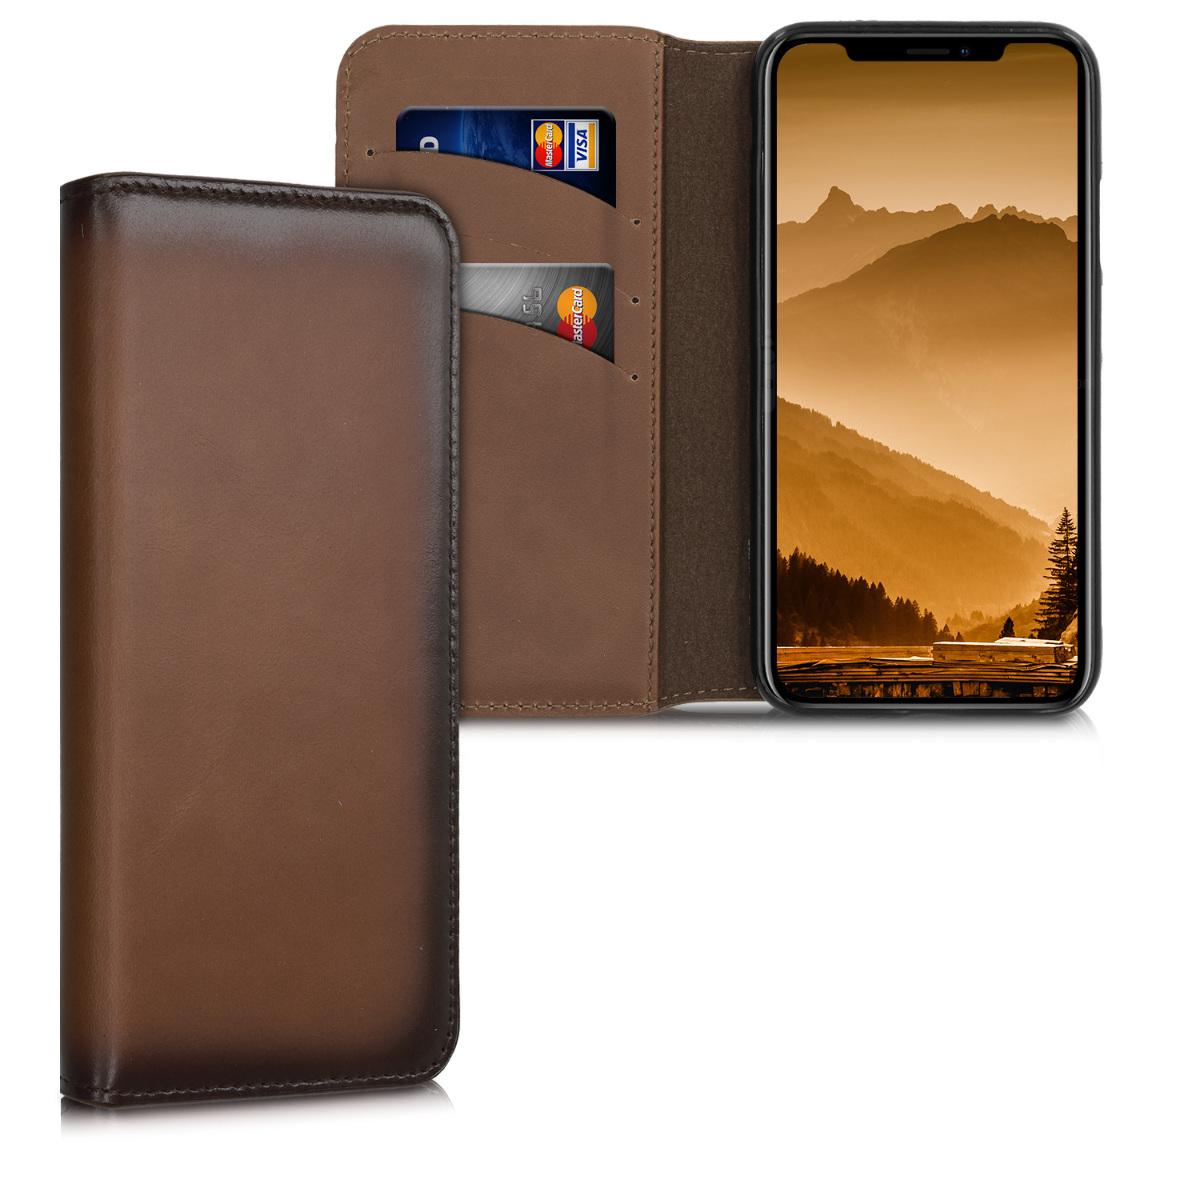 Kalibri Δερμάτινη Θήκη - Πορτοφόλι Apple iPhone XS - Vintage Brown (49516.133)